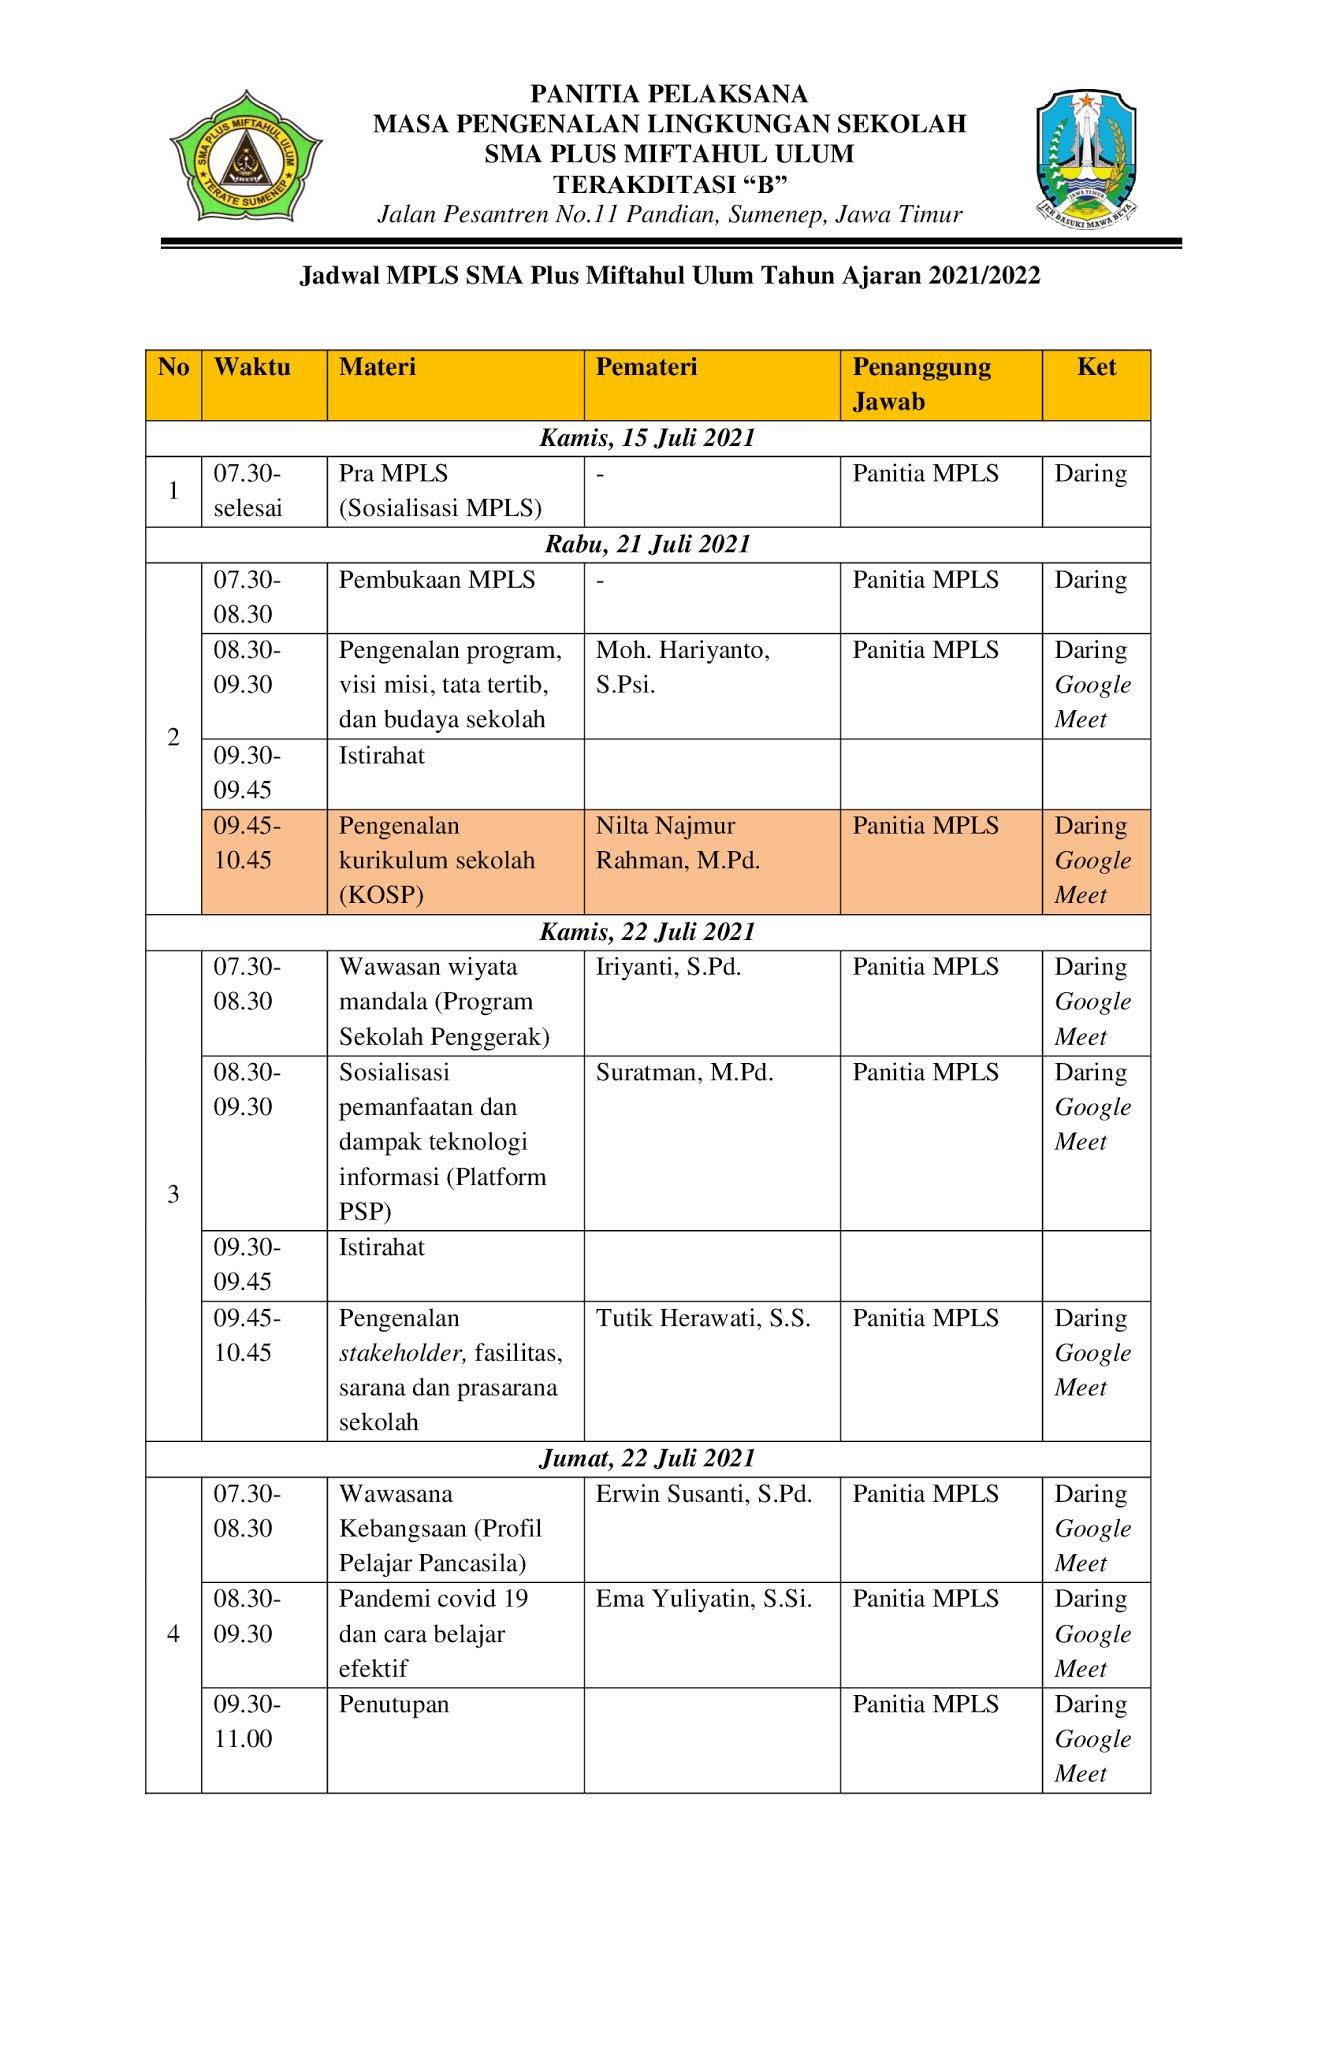 Jadwal MPLS SMA Plus Miftahul Ulum Tahun Ajaran 2021/2022